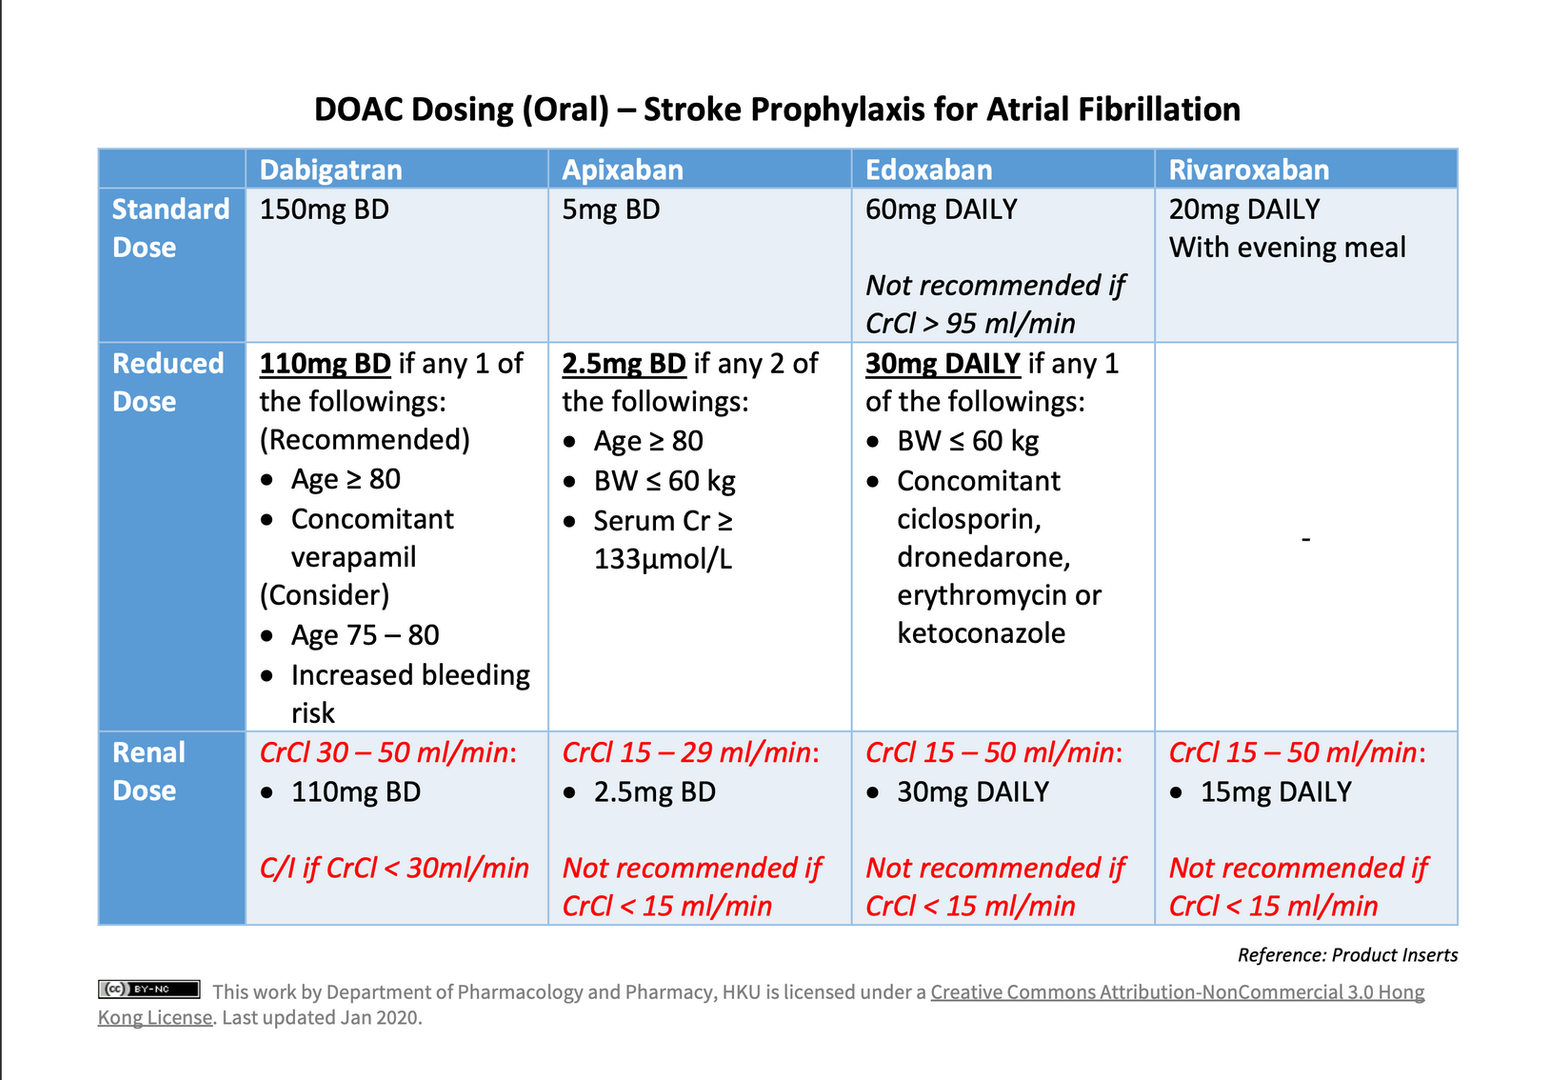 DOAC - Dosing in Stroke Prophylaxis for AF